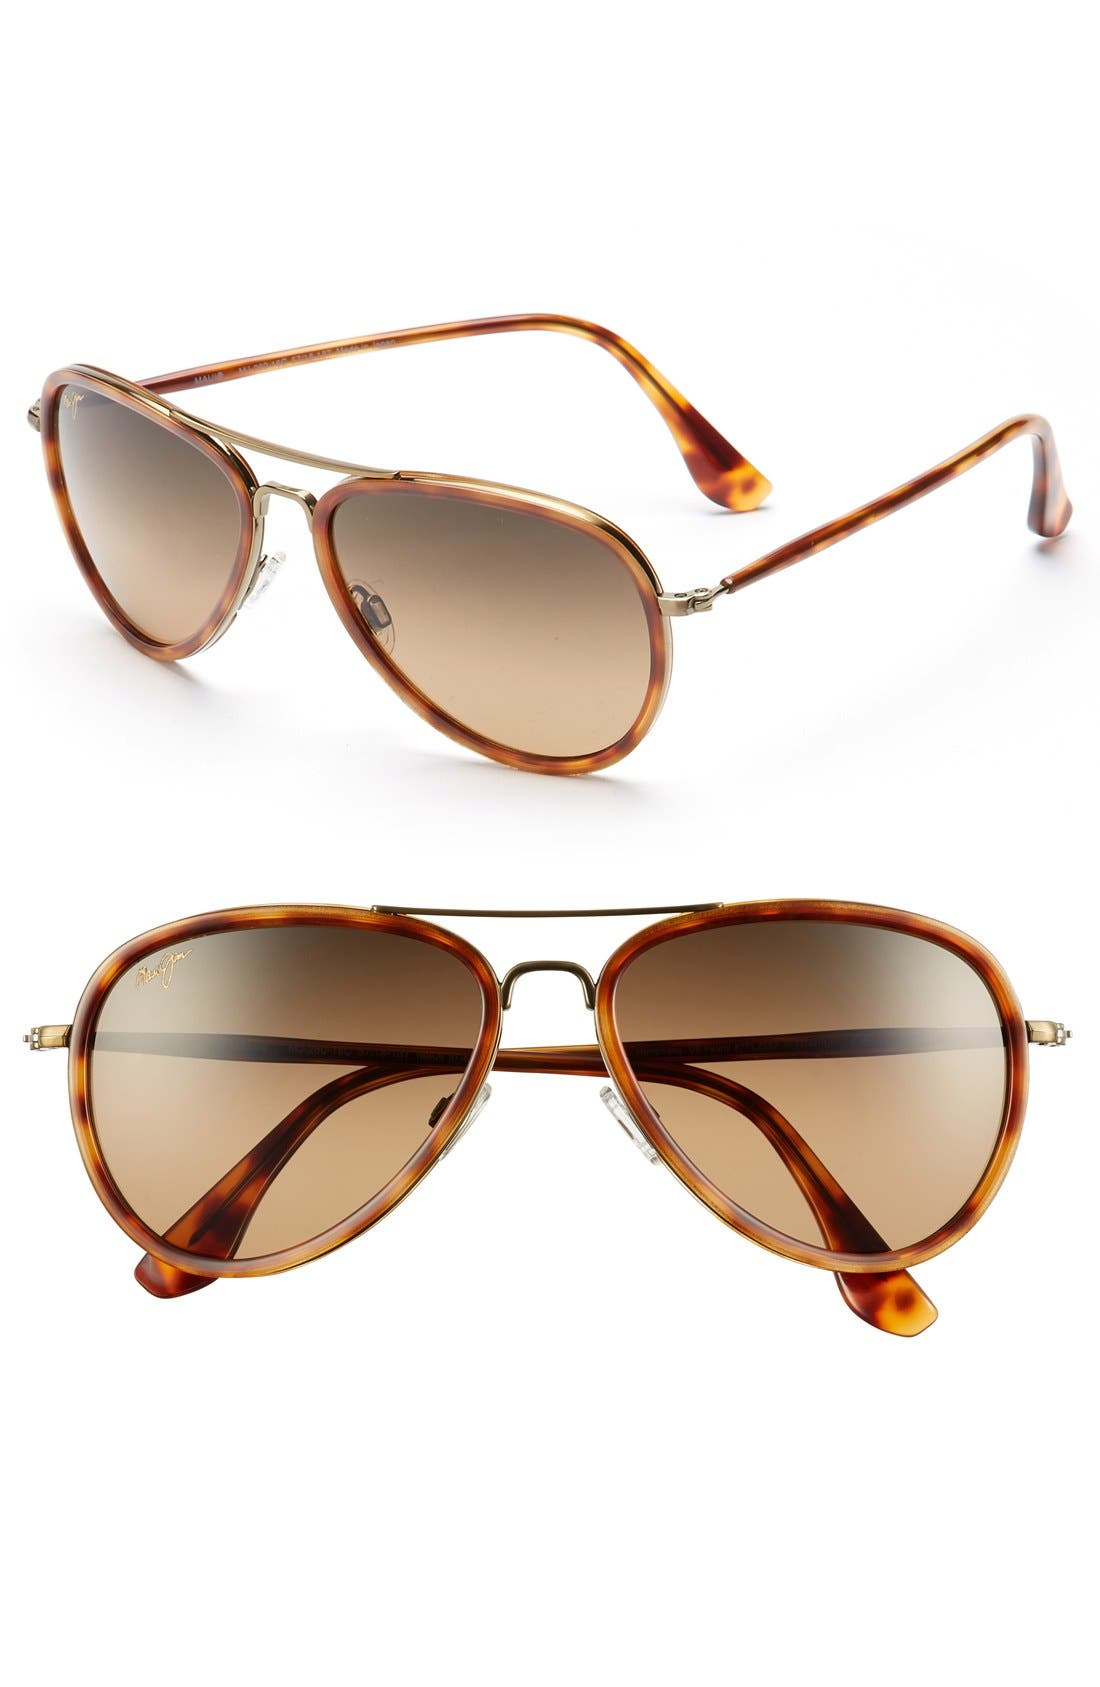 Honomanu 57mm PolarizedPlus2<sup>®</sup> Sunglasses,                             Main thumbnail 1, color,                             710